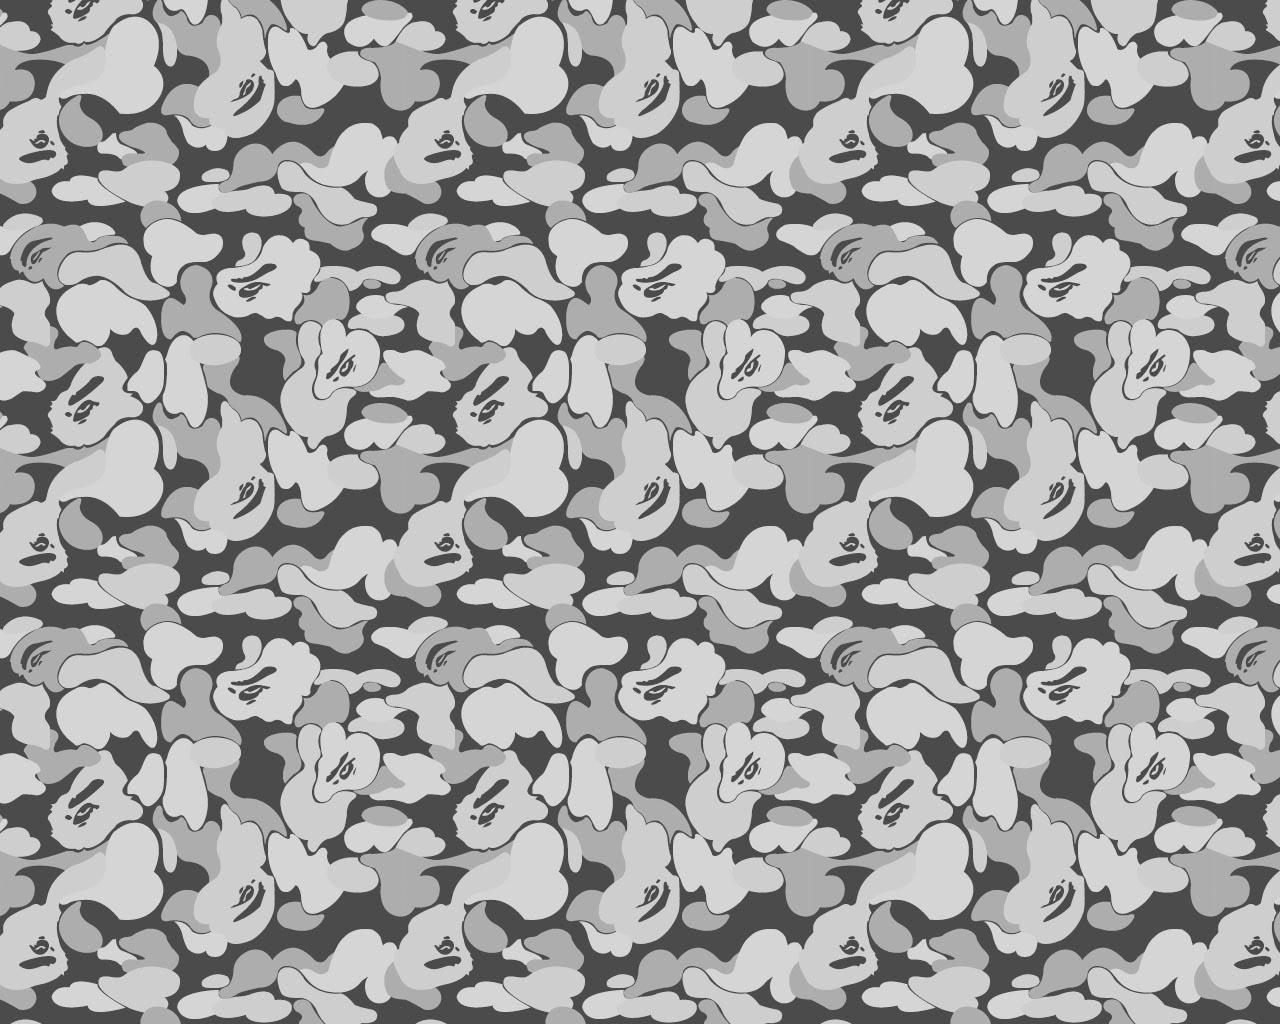 Purple Bape Camo Wallpaper Bape wallpaper   bathing ape 1280x1024